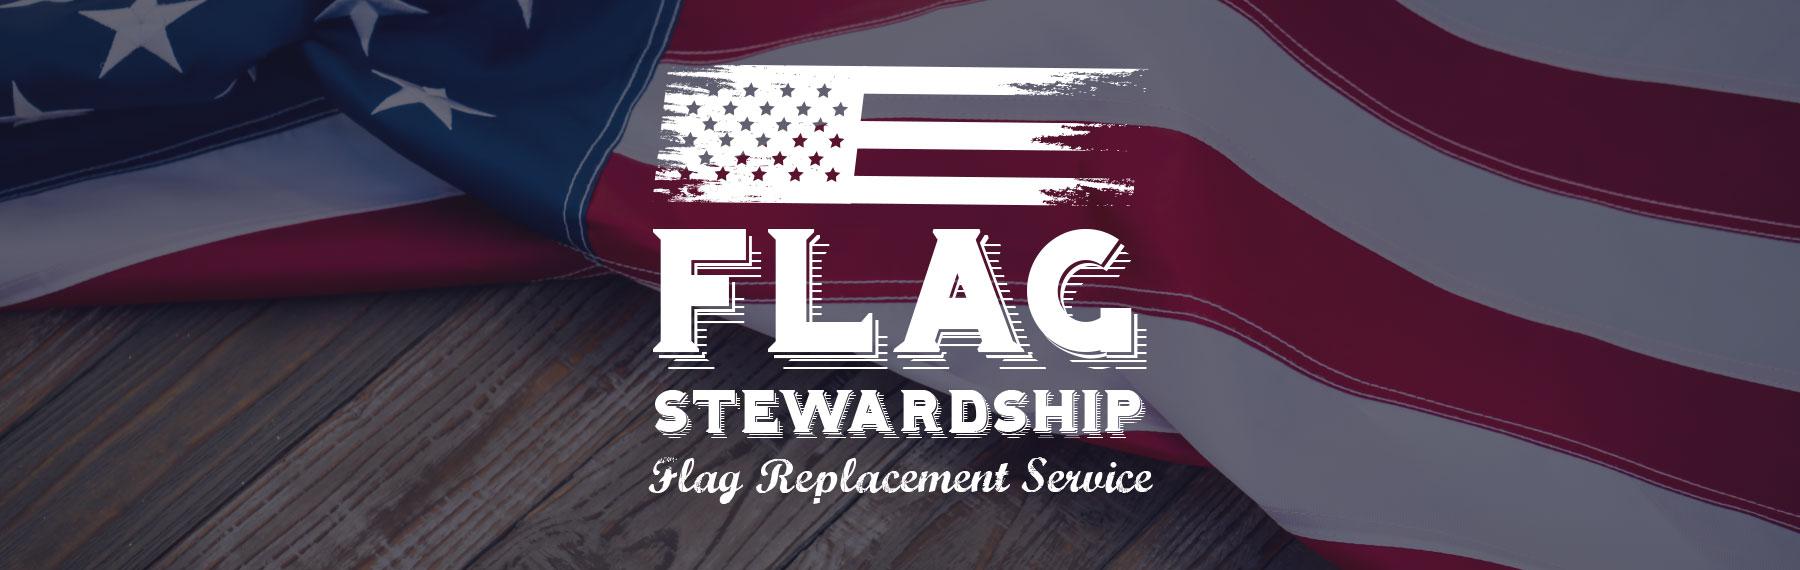 stewardship-hero.jpg